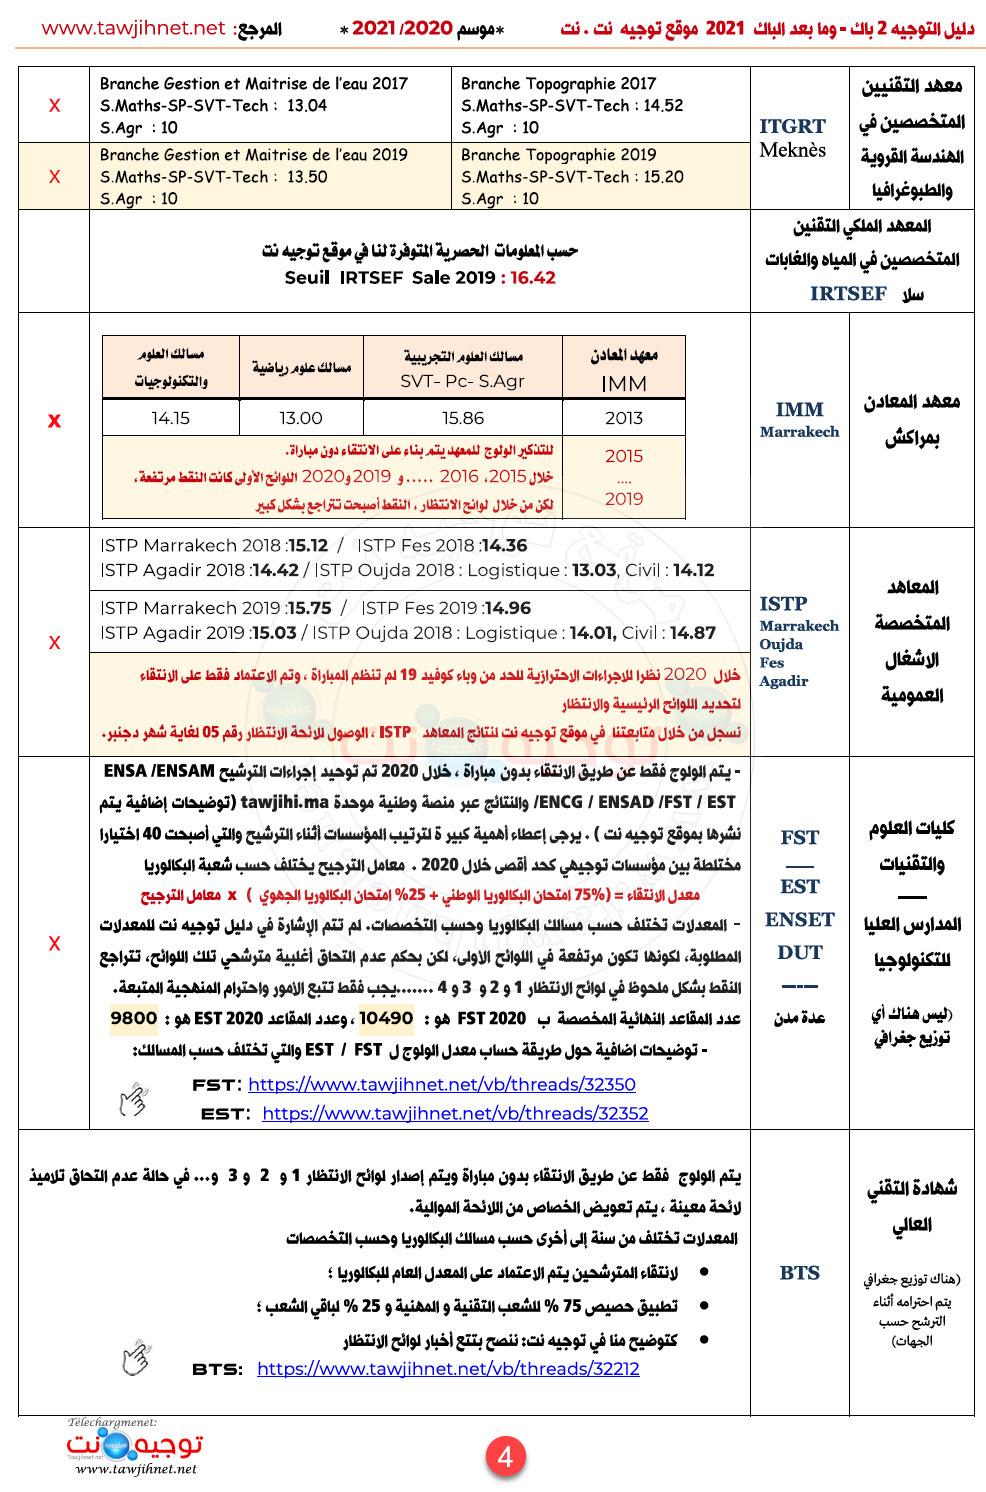 seuils-preselection-ecoles-instituts-maroc-2021_Page_4.jpg